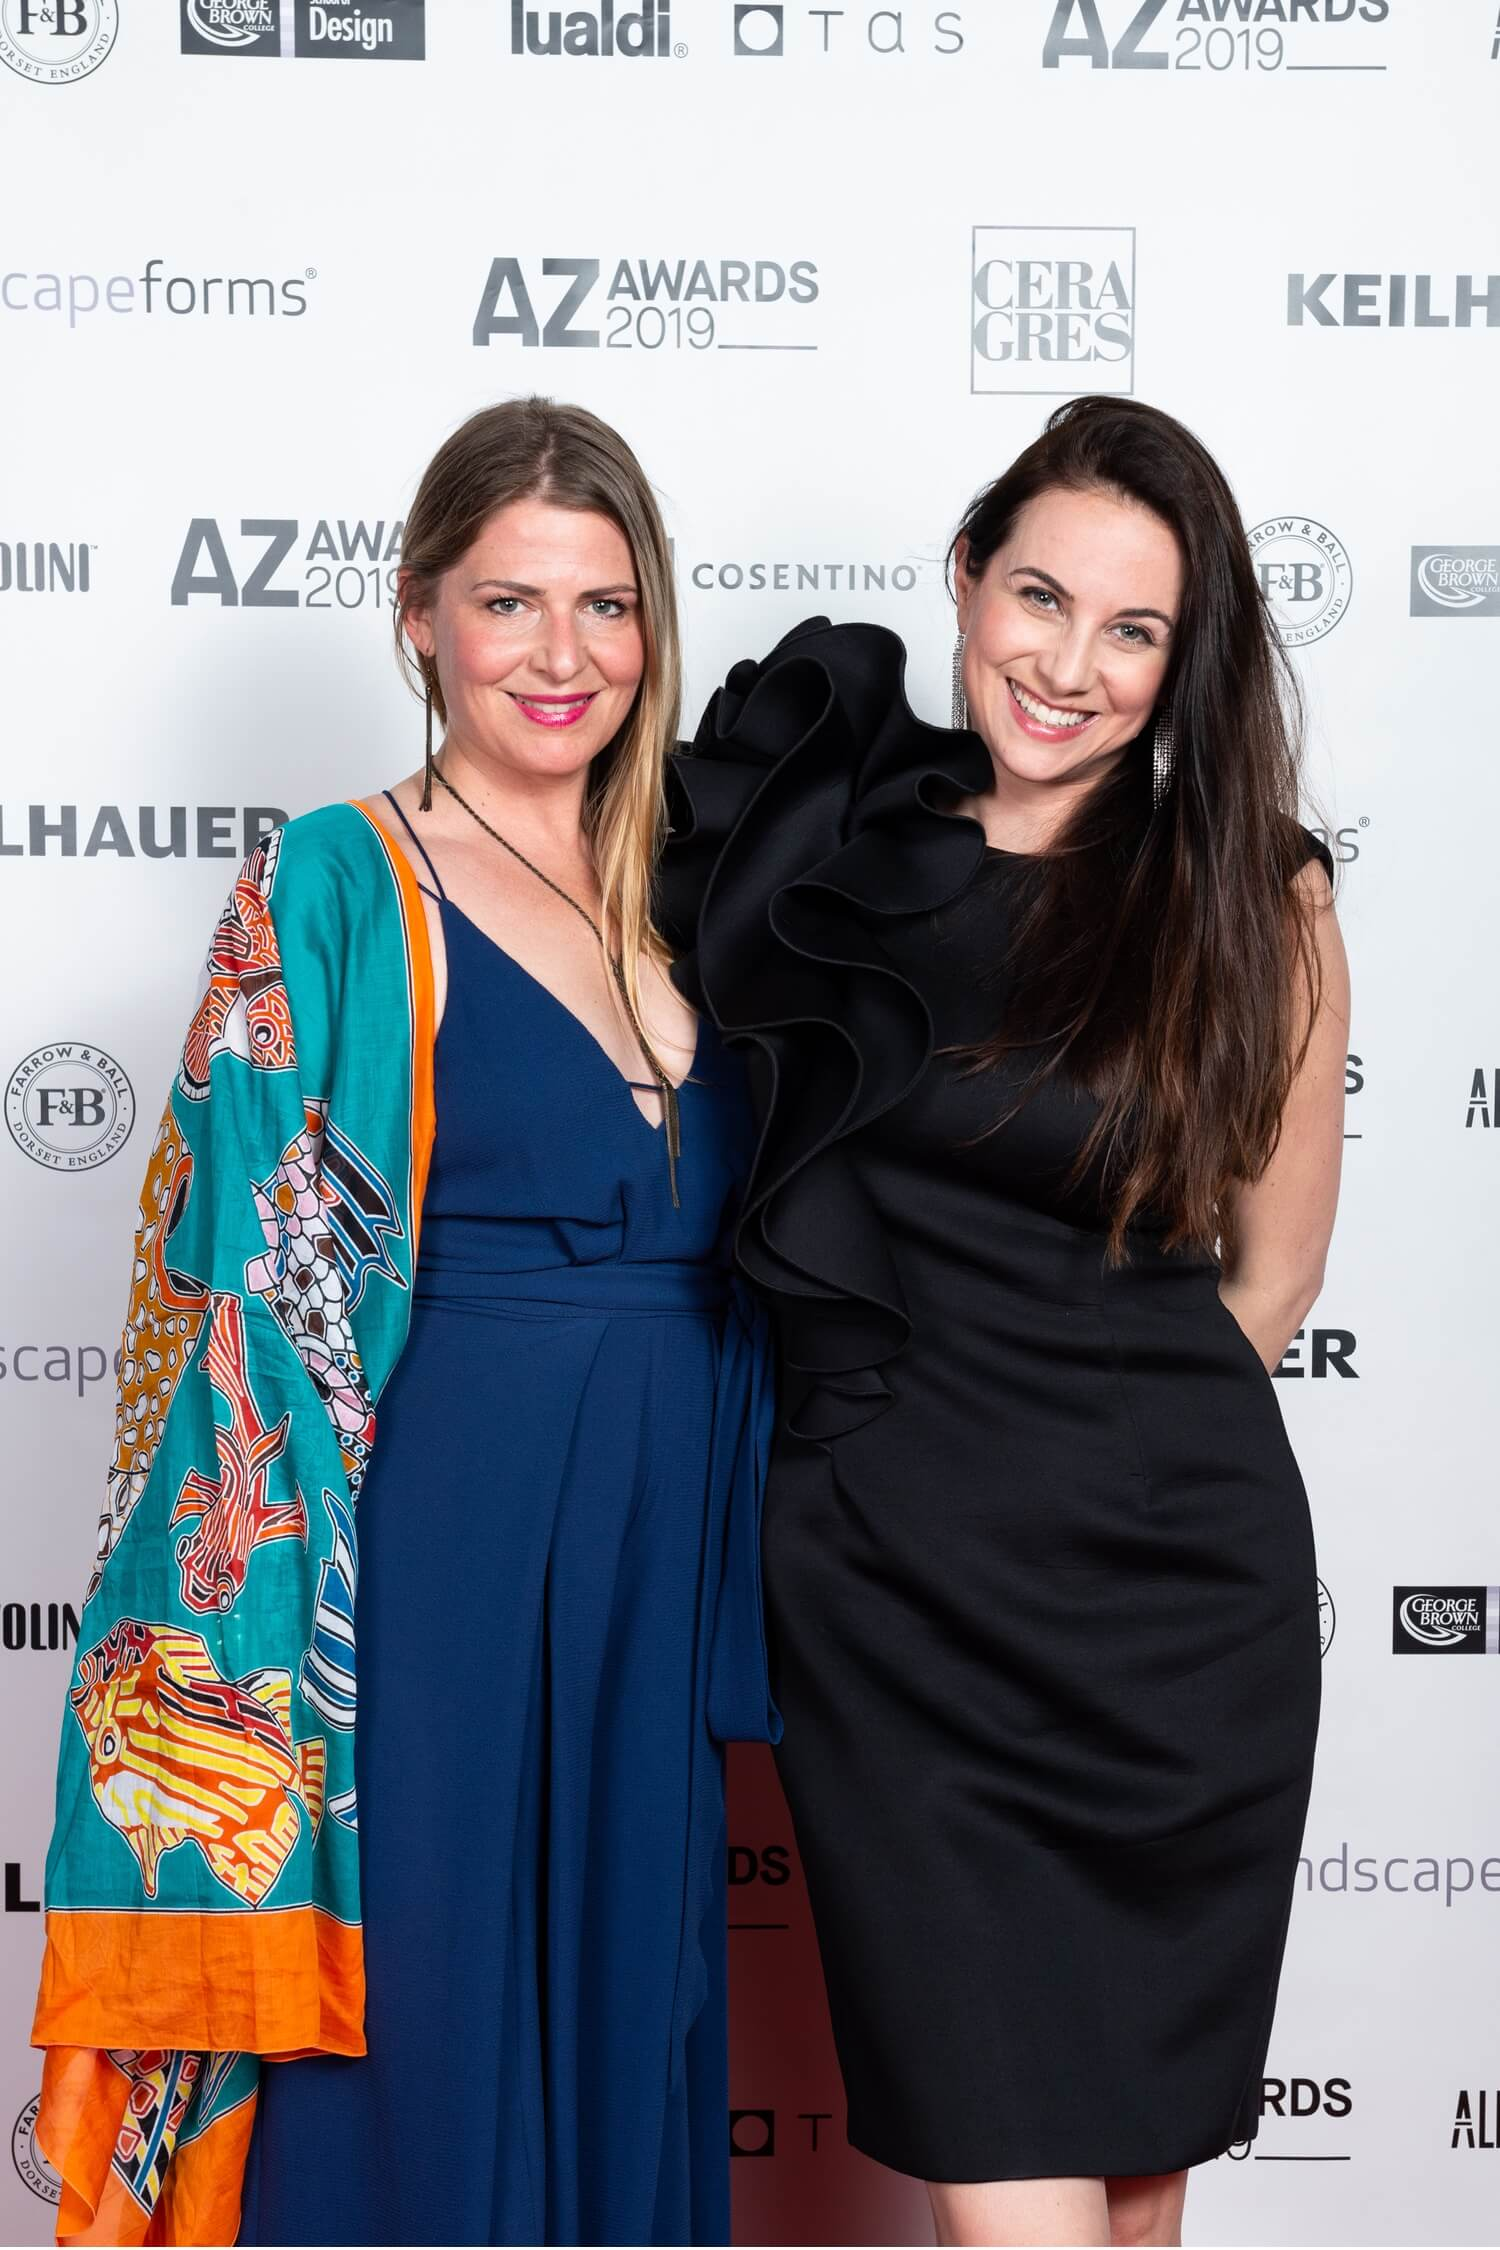 Step and repeat with Cara McBride and Sandra Rizkalla, AZ Awards 2019: Scenes from the Gala